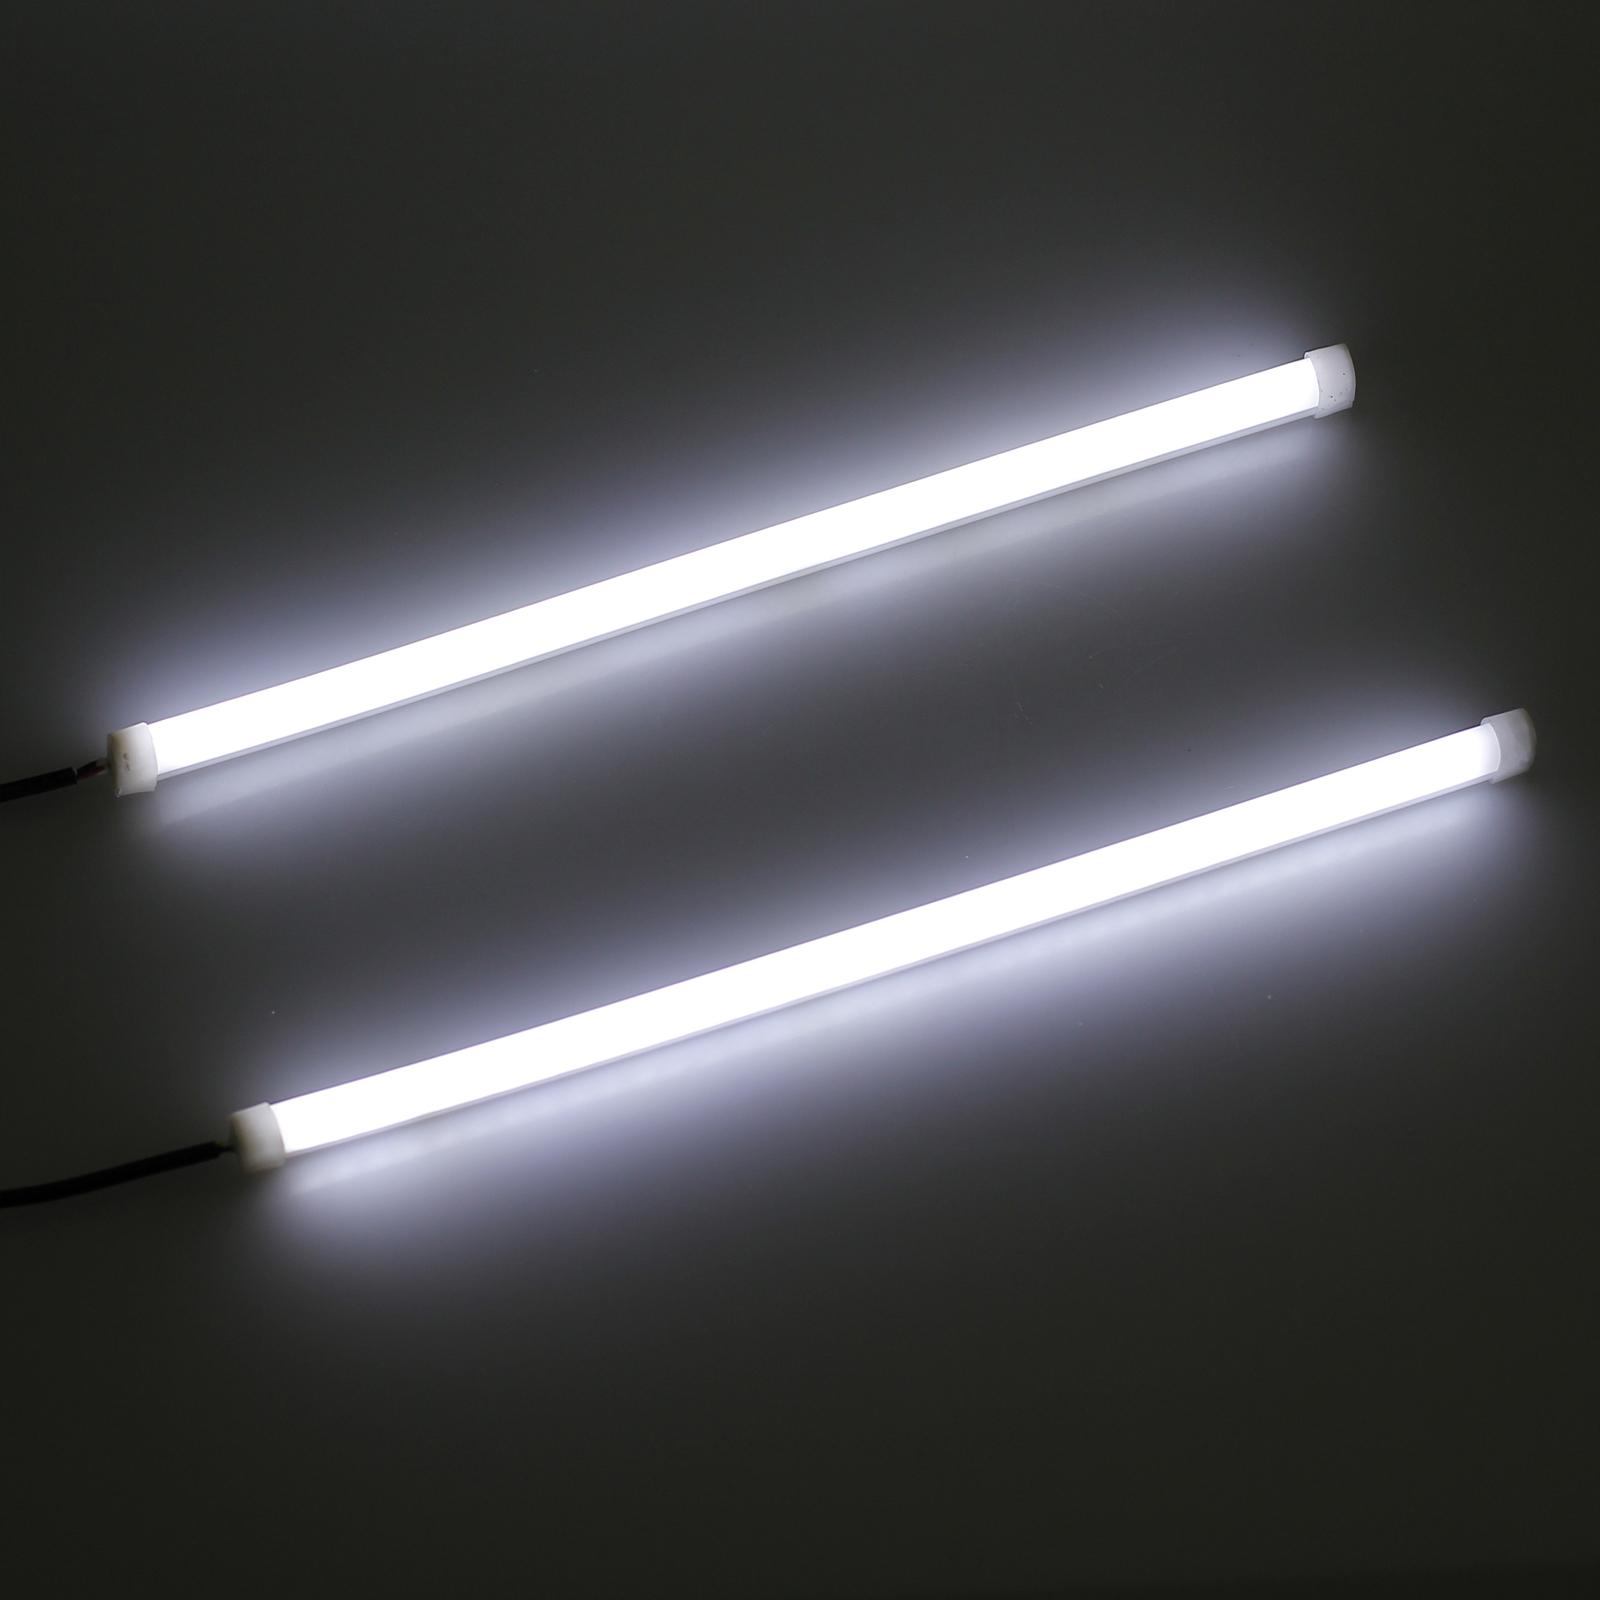 2x 30cm led auto tagfahrlicht drl strip streifen lampe. Black Bedroom Furniture Sets. Home Design Ideas